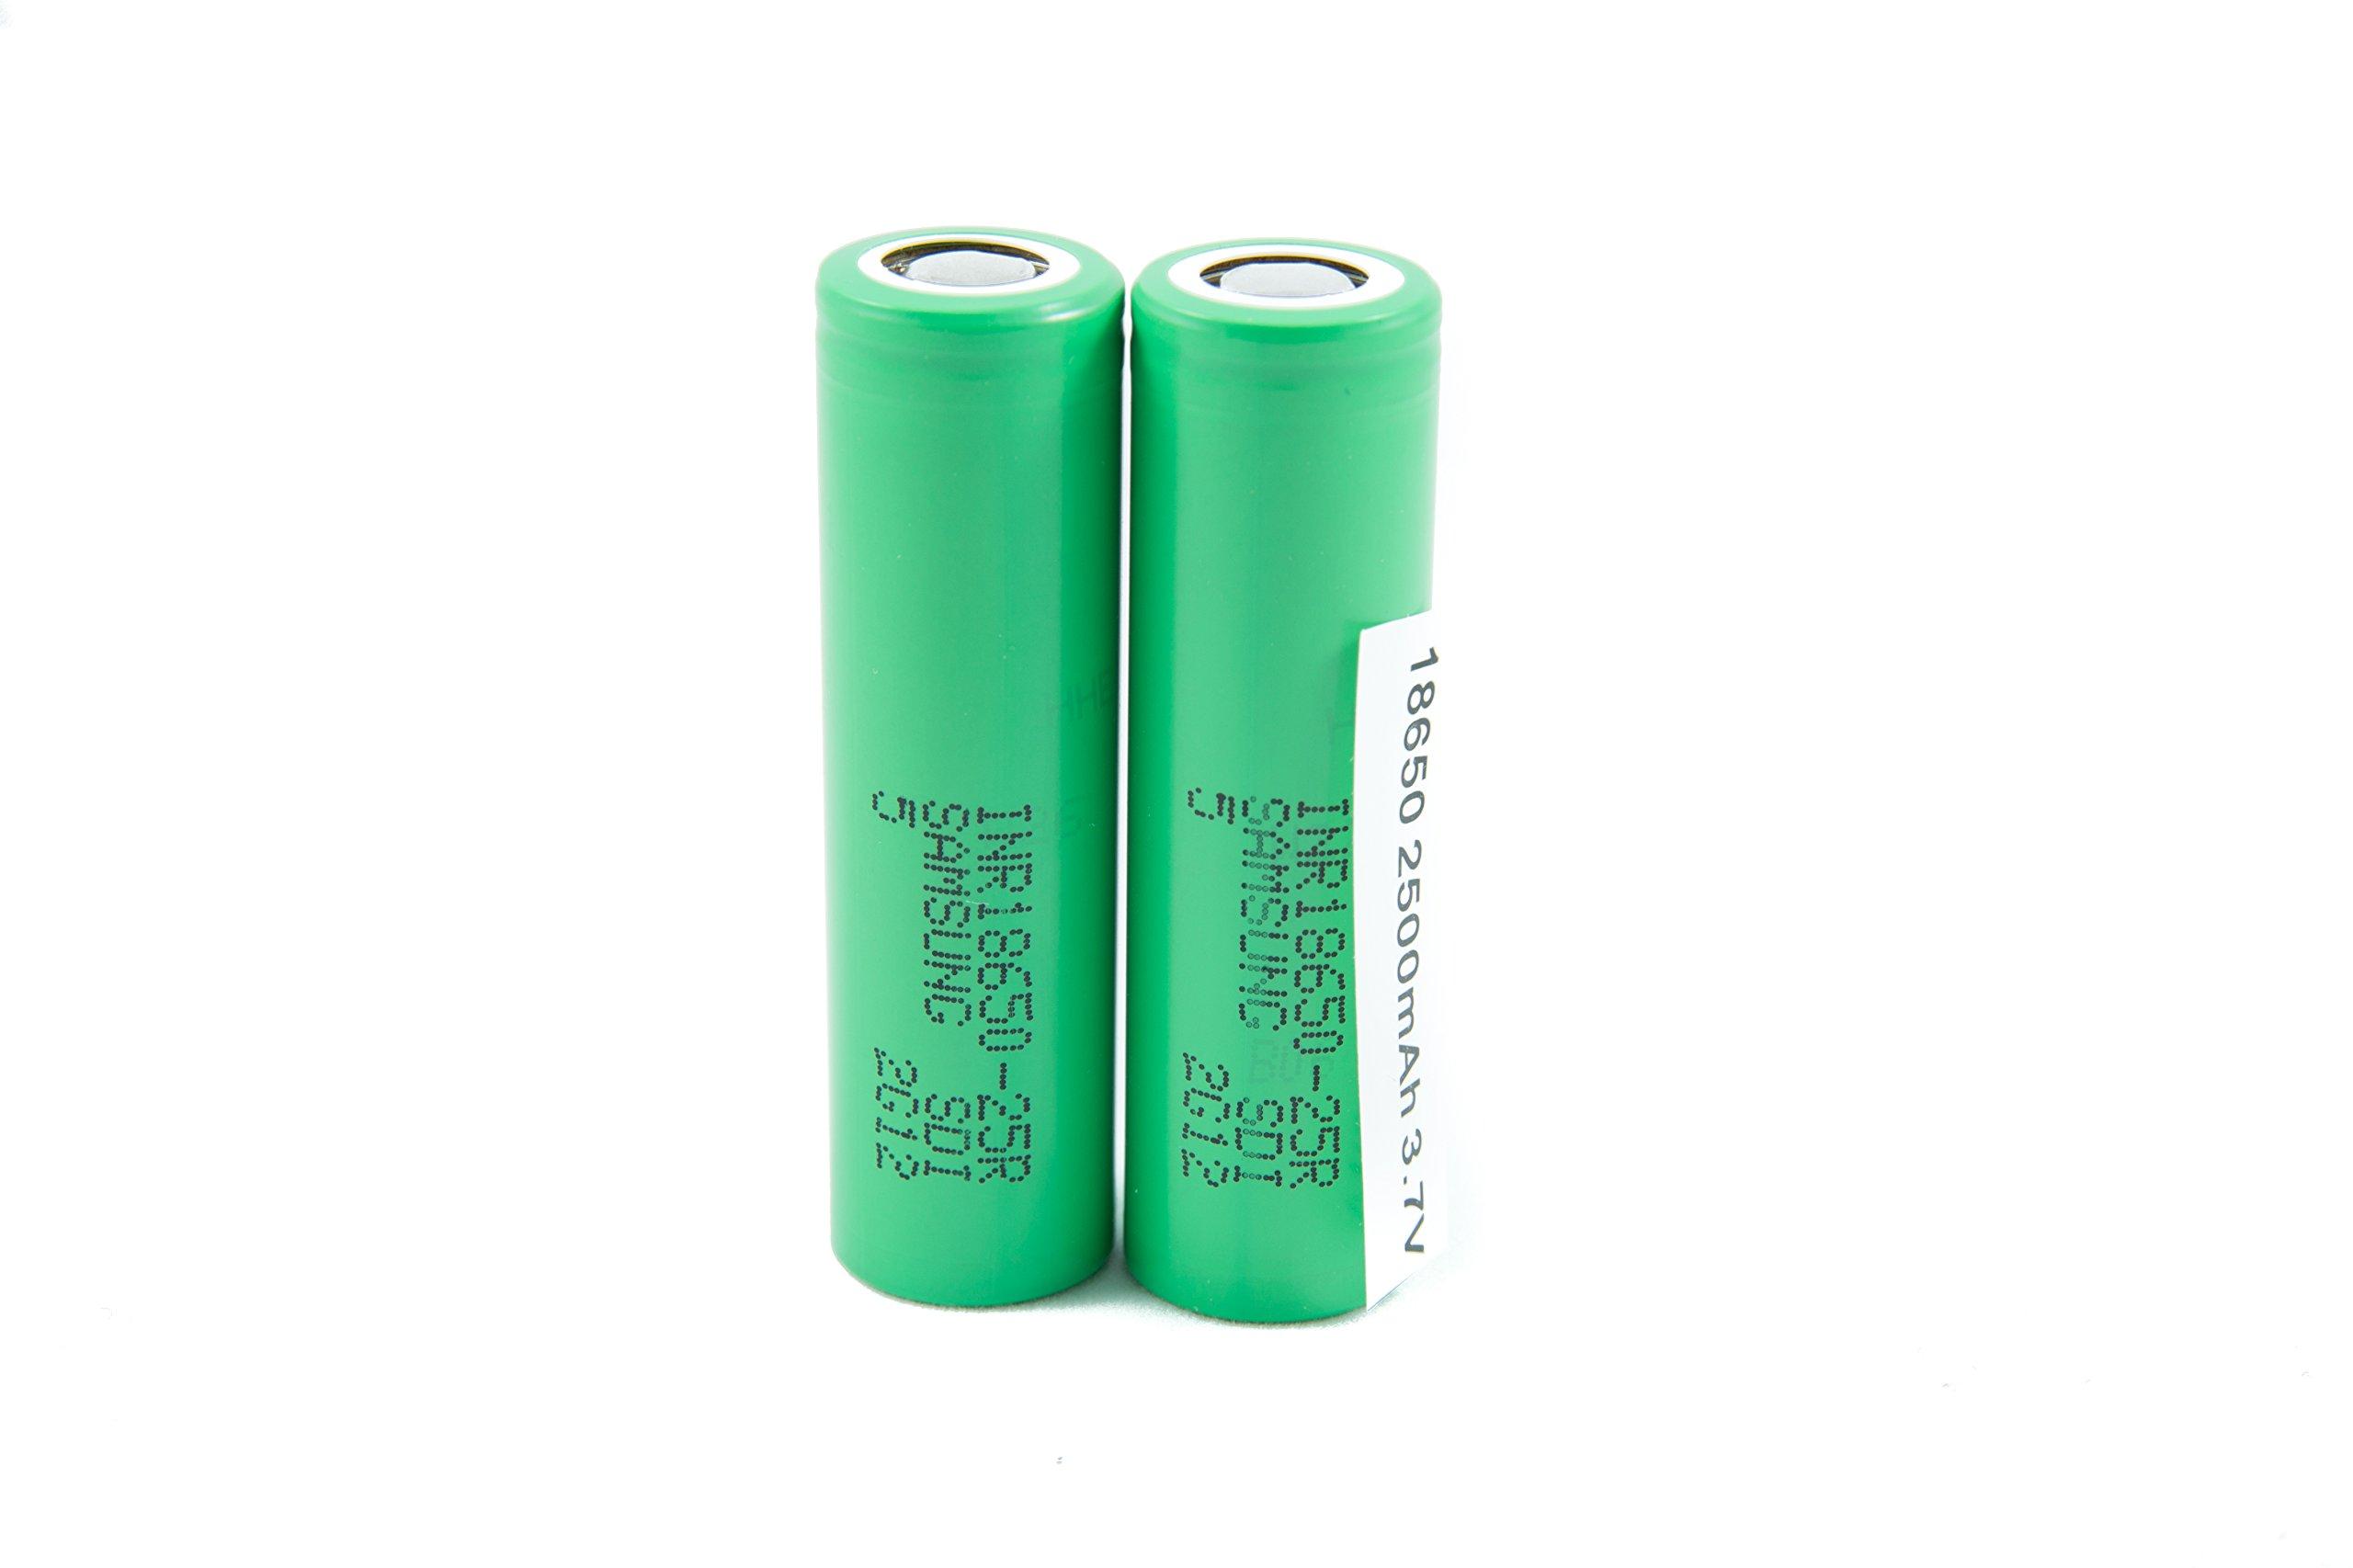 2pcs Samsung INR18650-25R 18650 2500mAh 3.7v Li-ion 20A discharge Authentic Grade-A Guarantee by CTINAW HOBBY (Image #7)